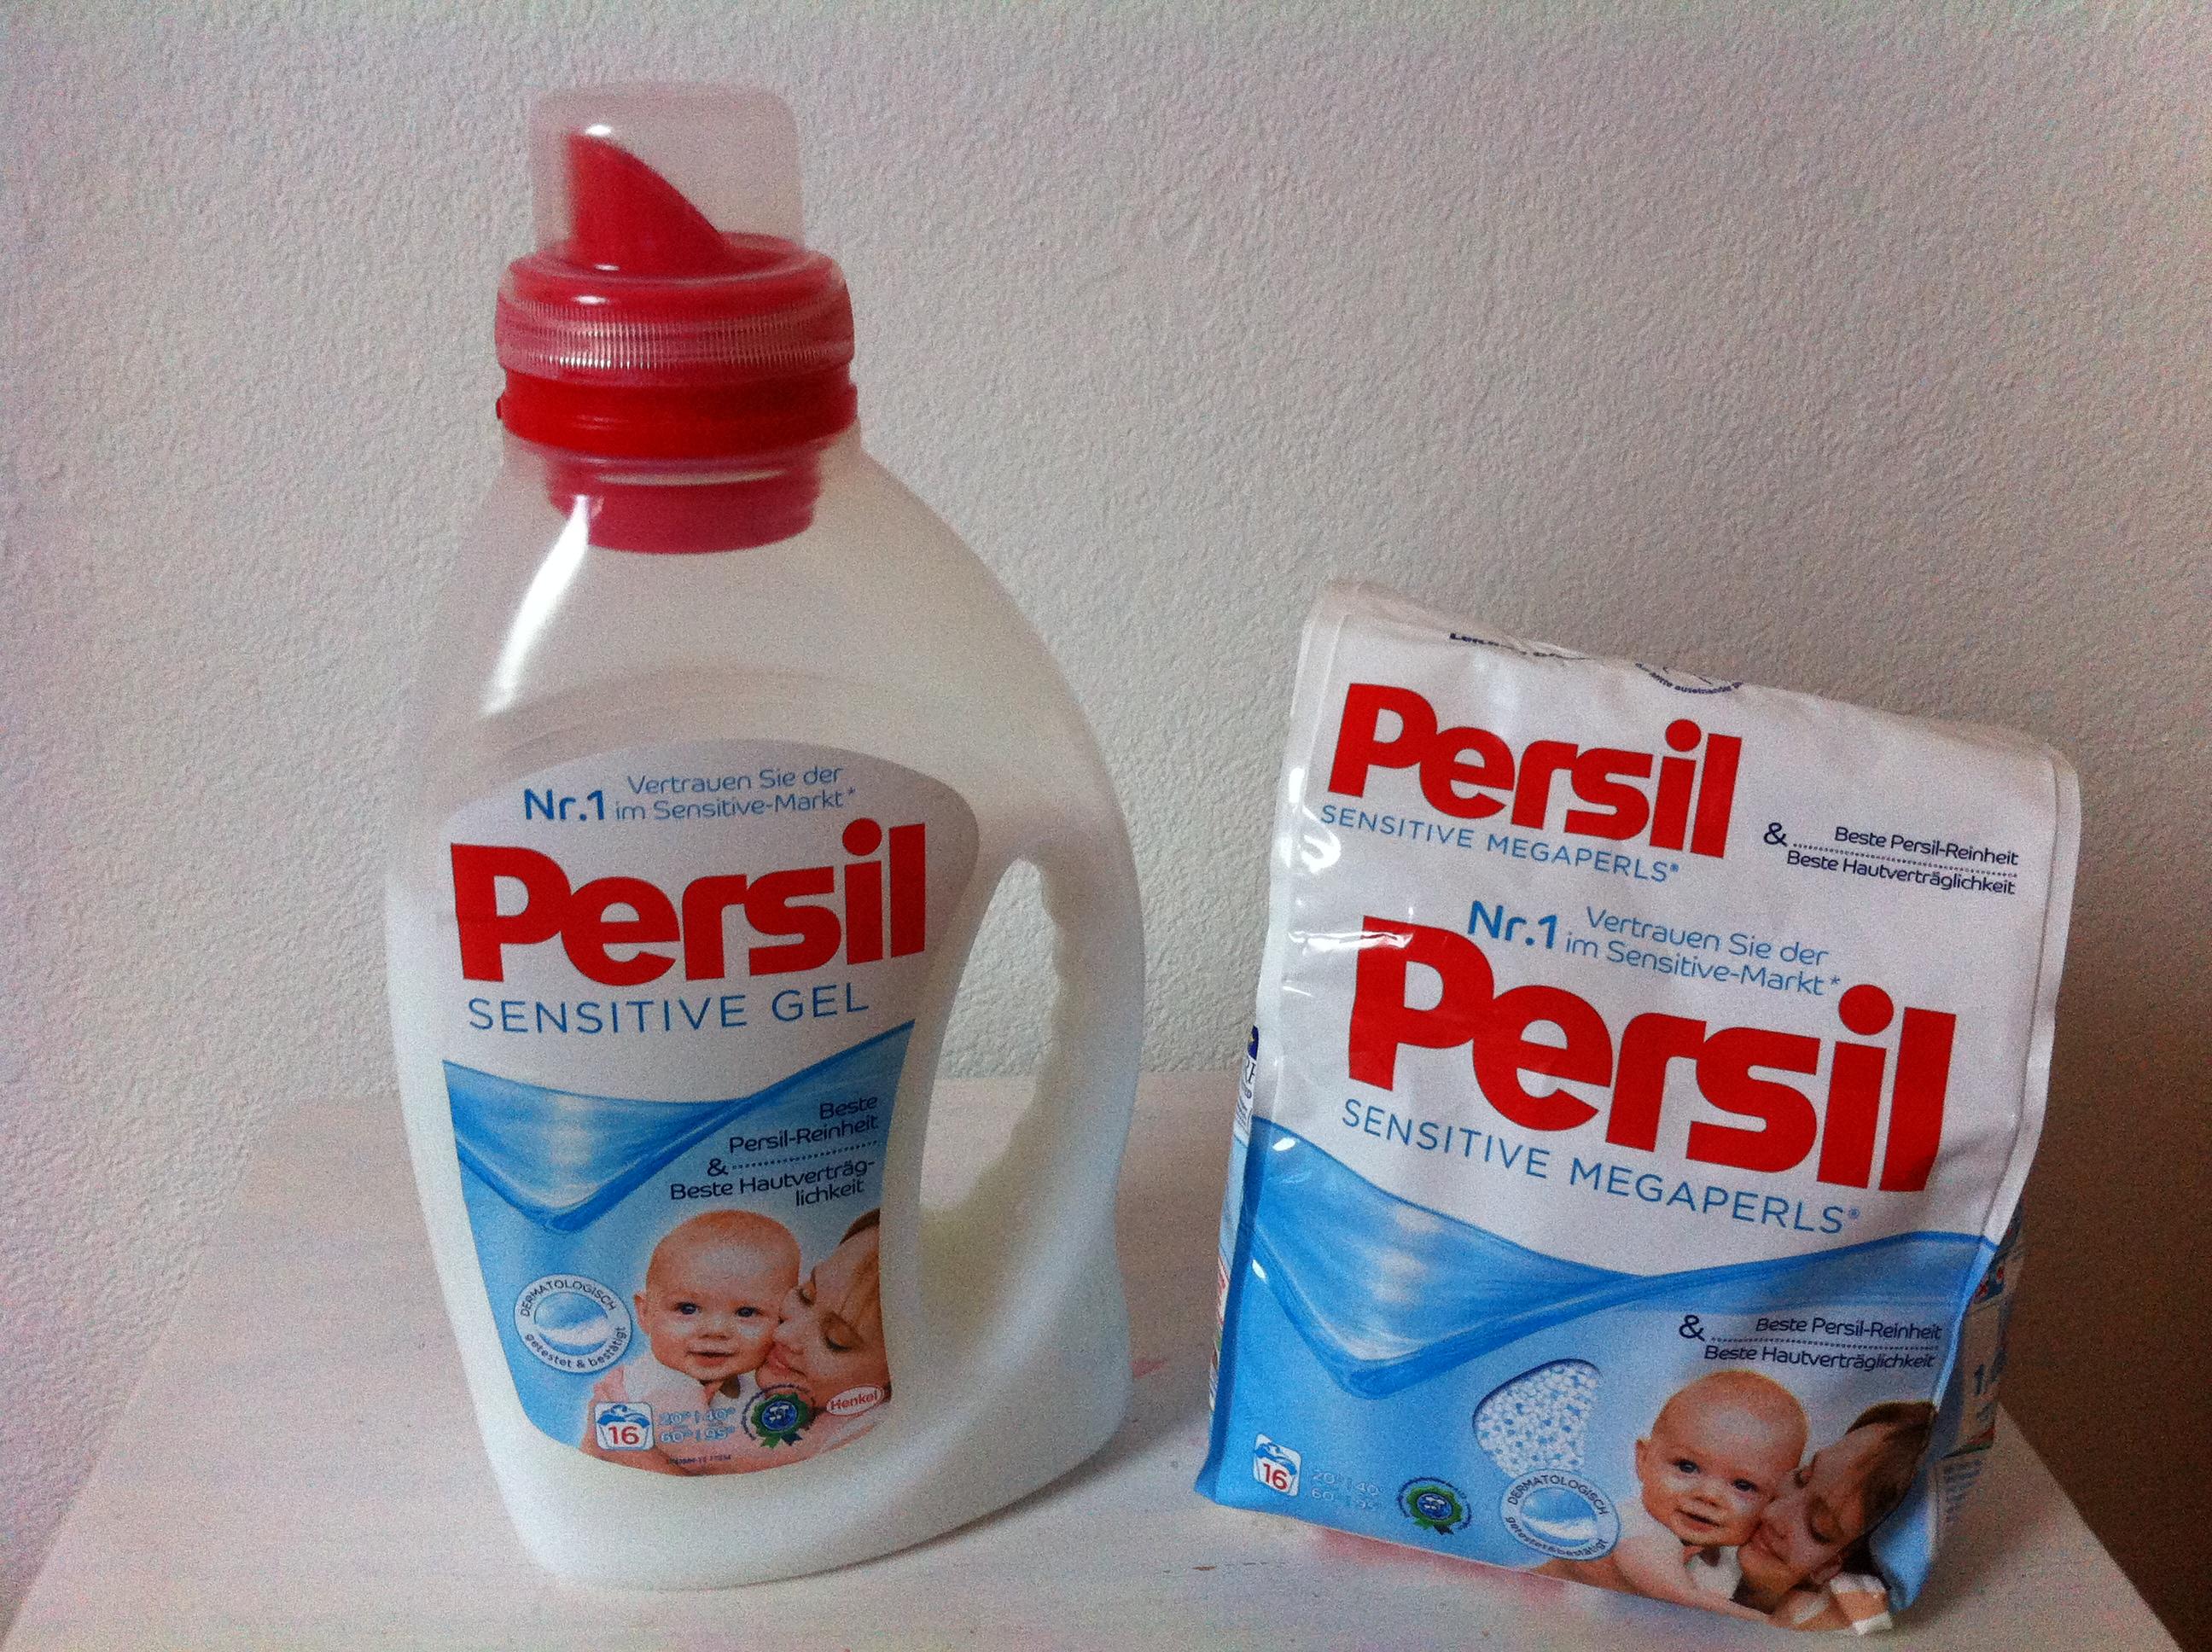 persil-sensitive-megaperls-gel